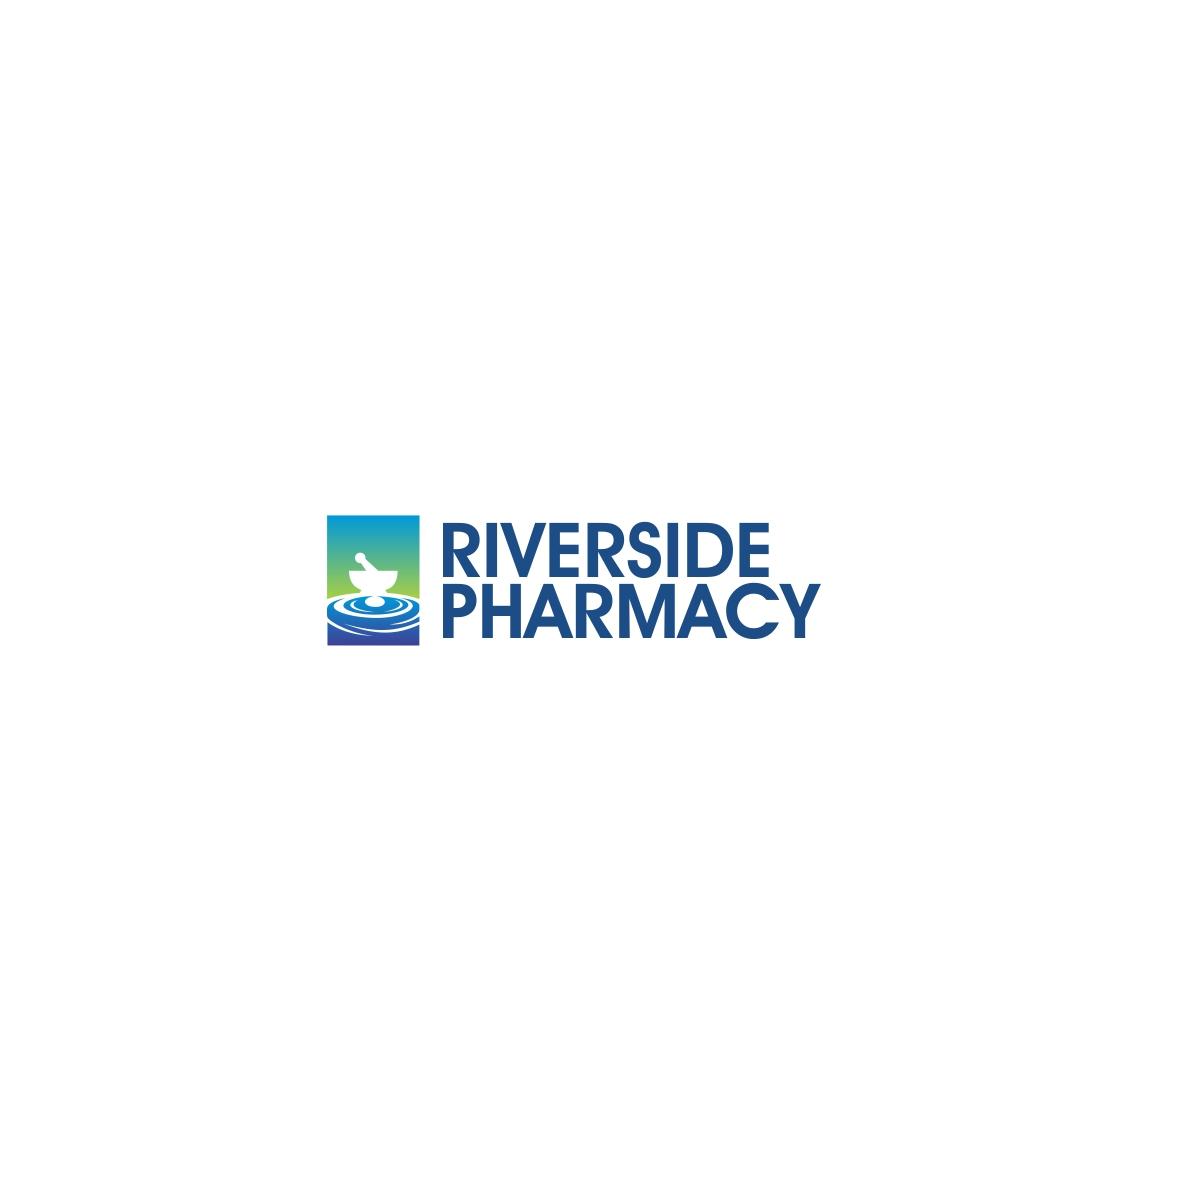 Riverside Graphic Design Jobs